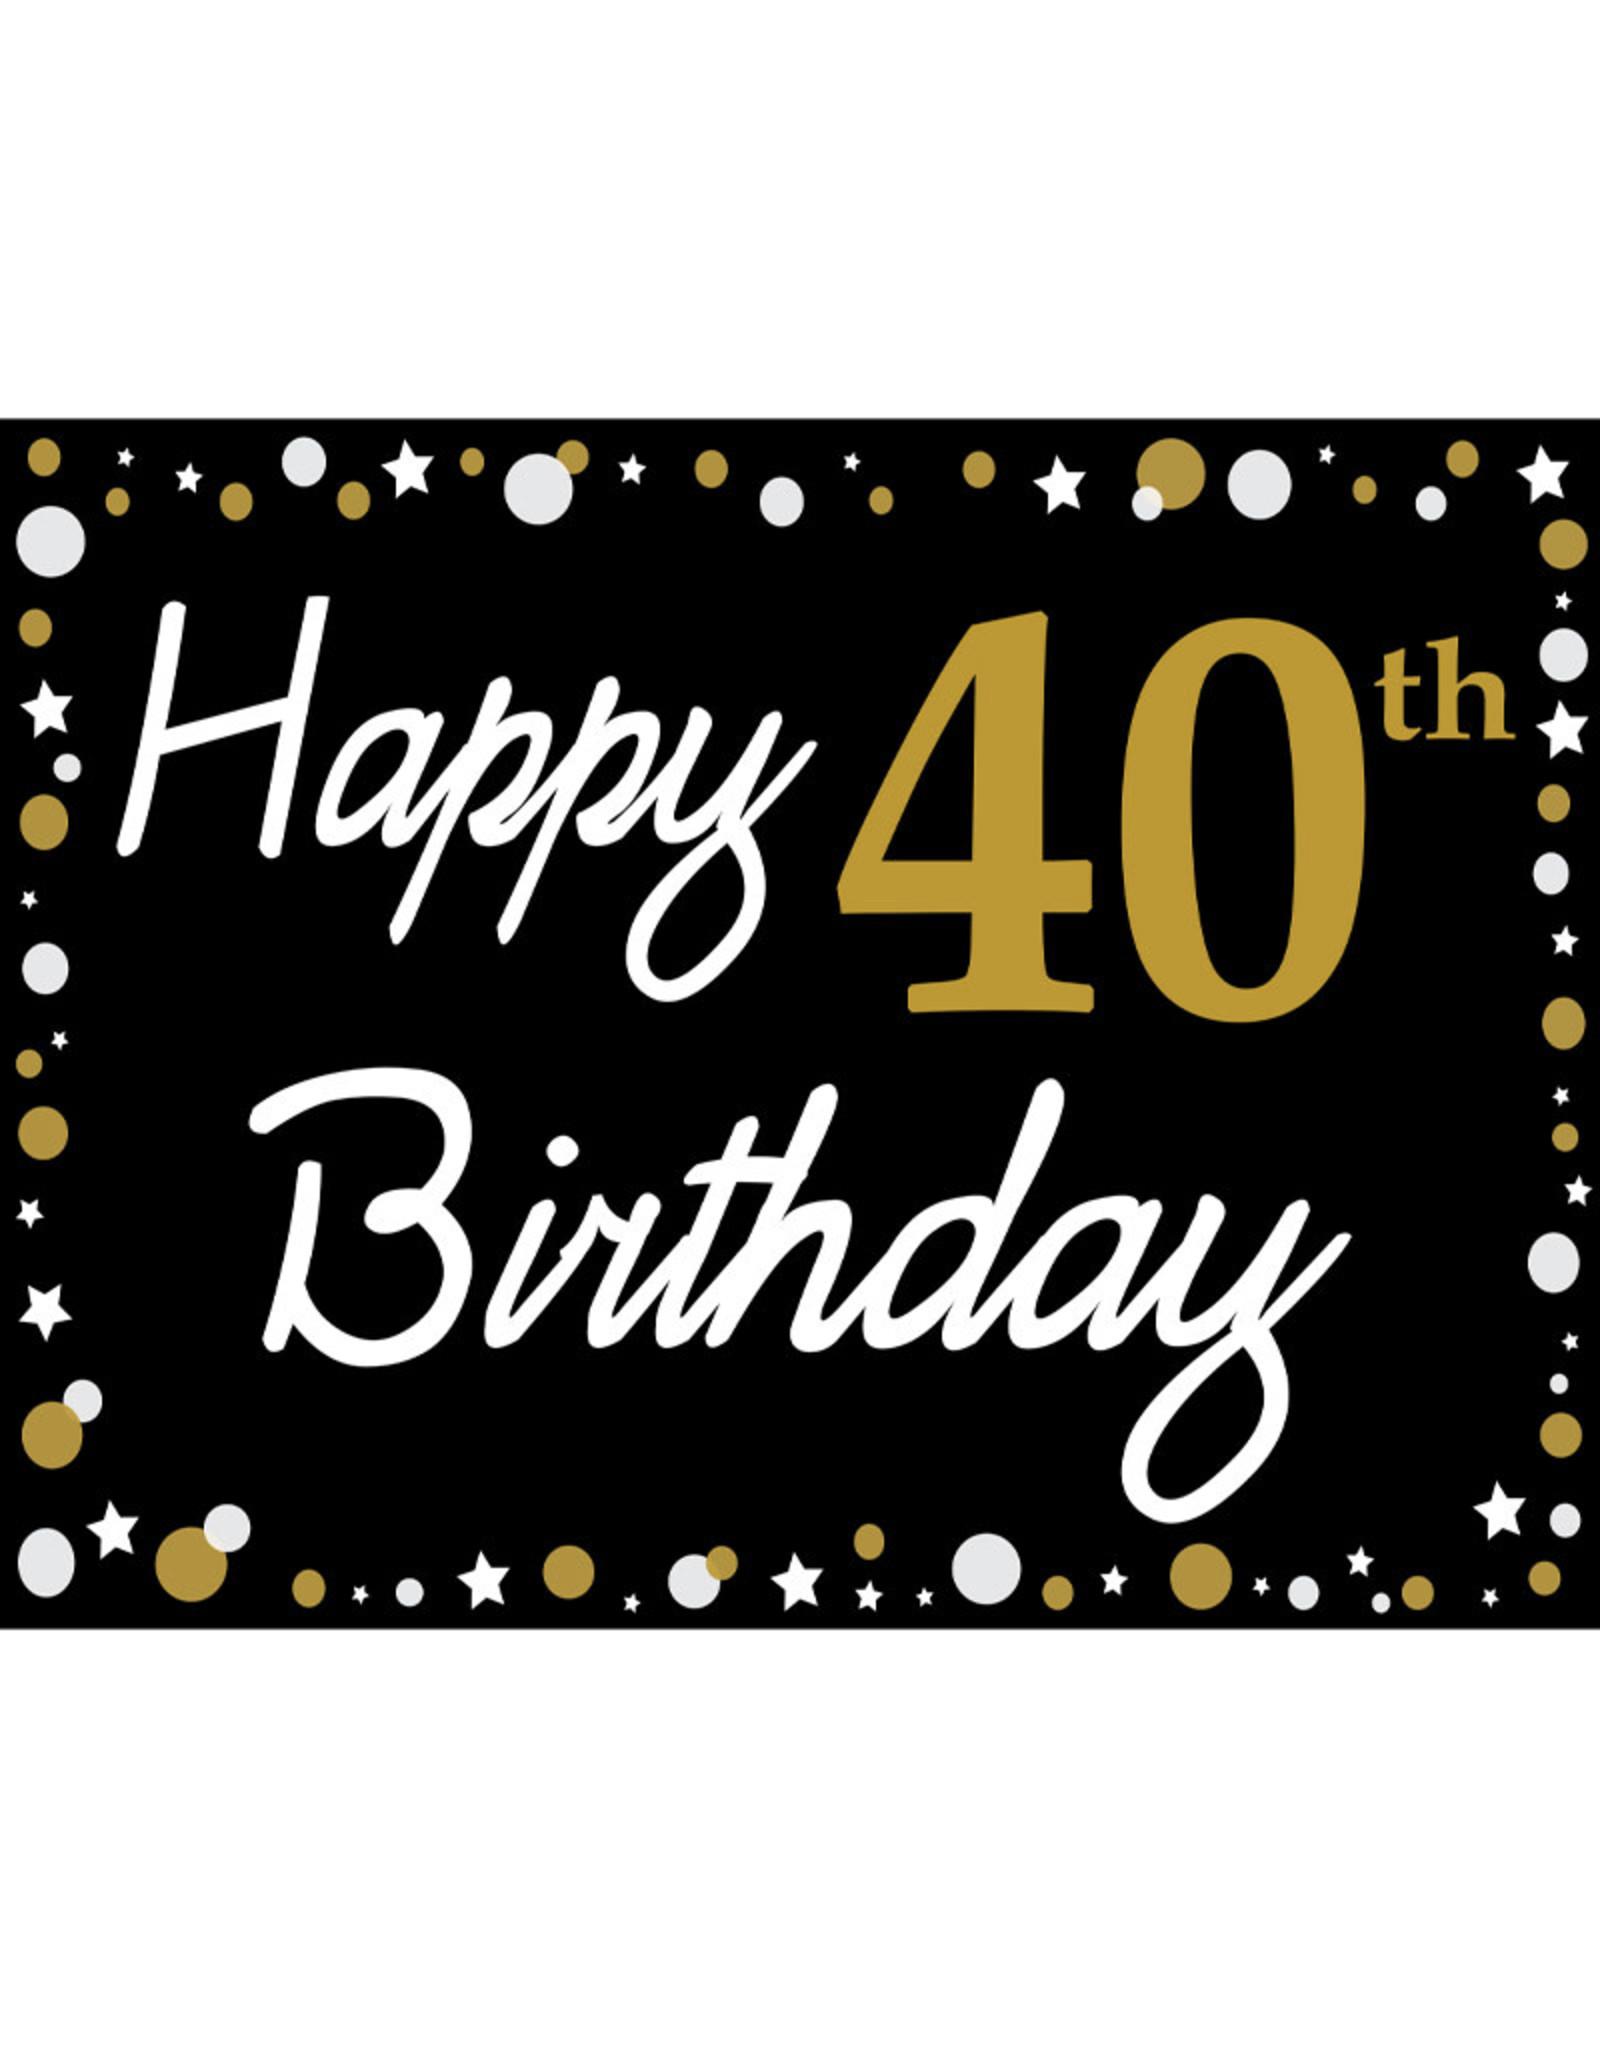 Happy 40th Birthday - Black, Gold & White Yard Sign